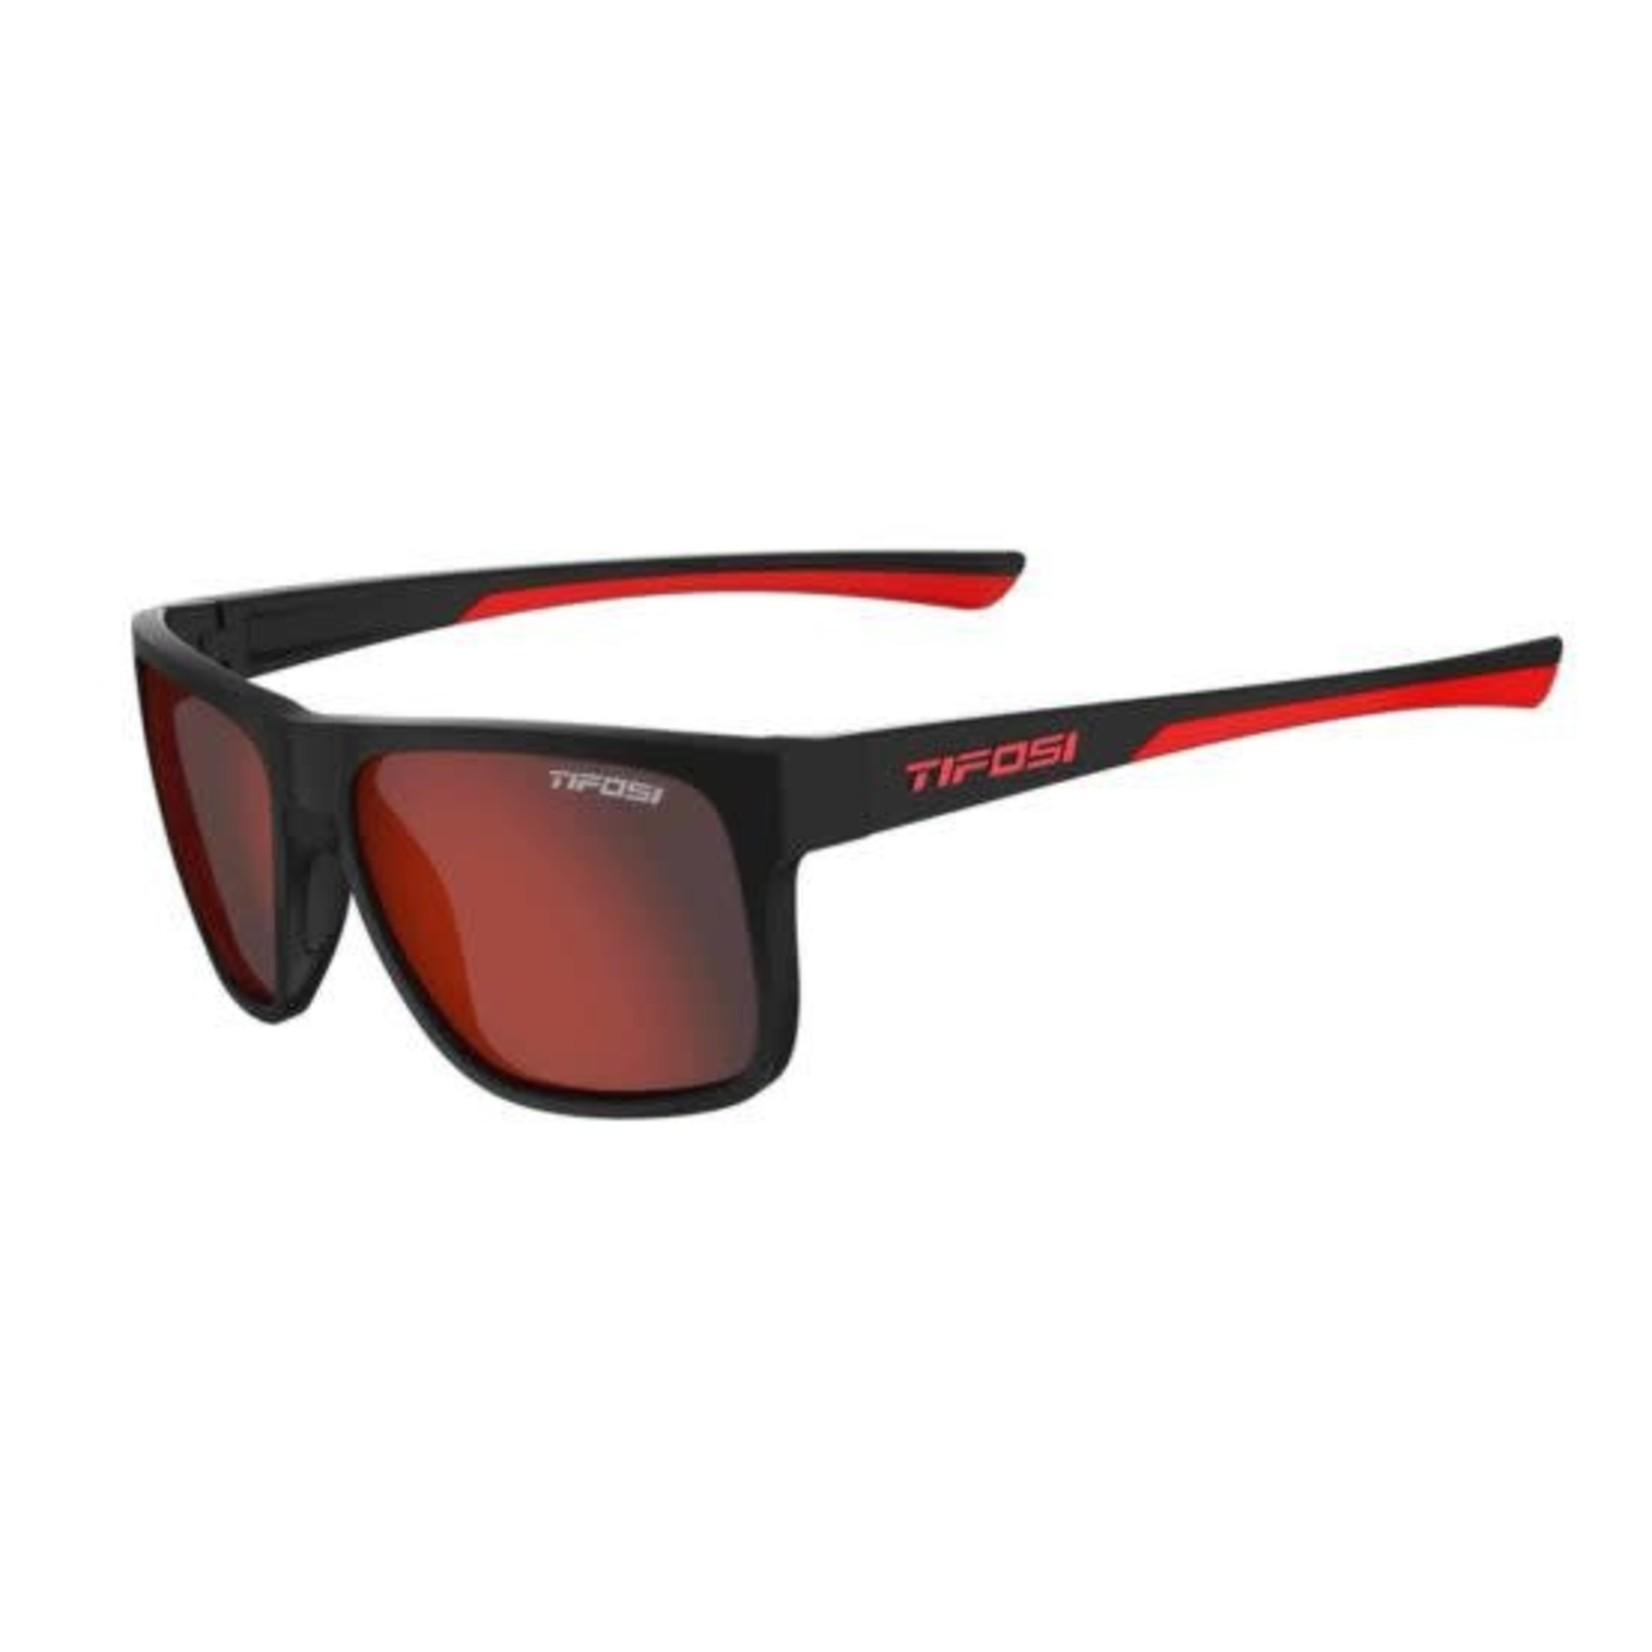 Tifosi Optics Swick, Satin Black/Crimson Single Lens Sunglasses